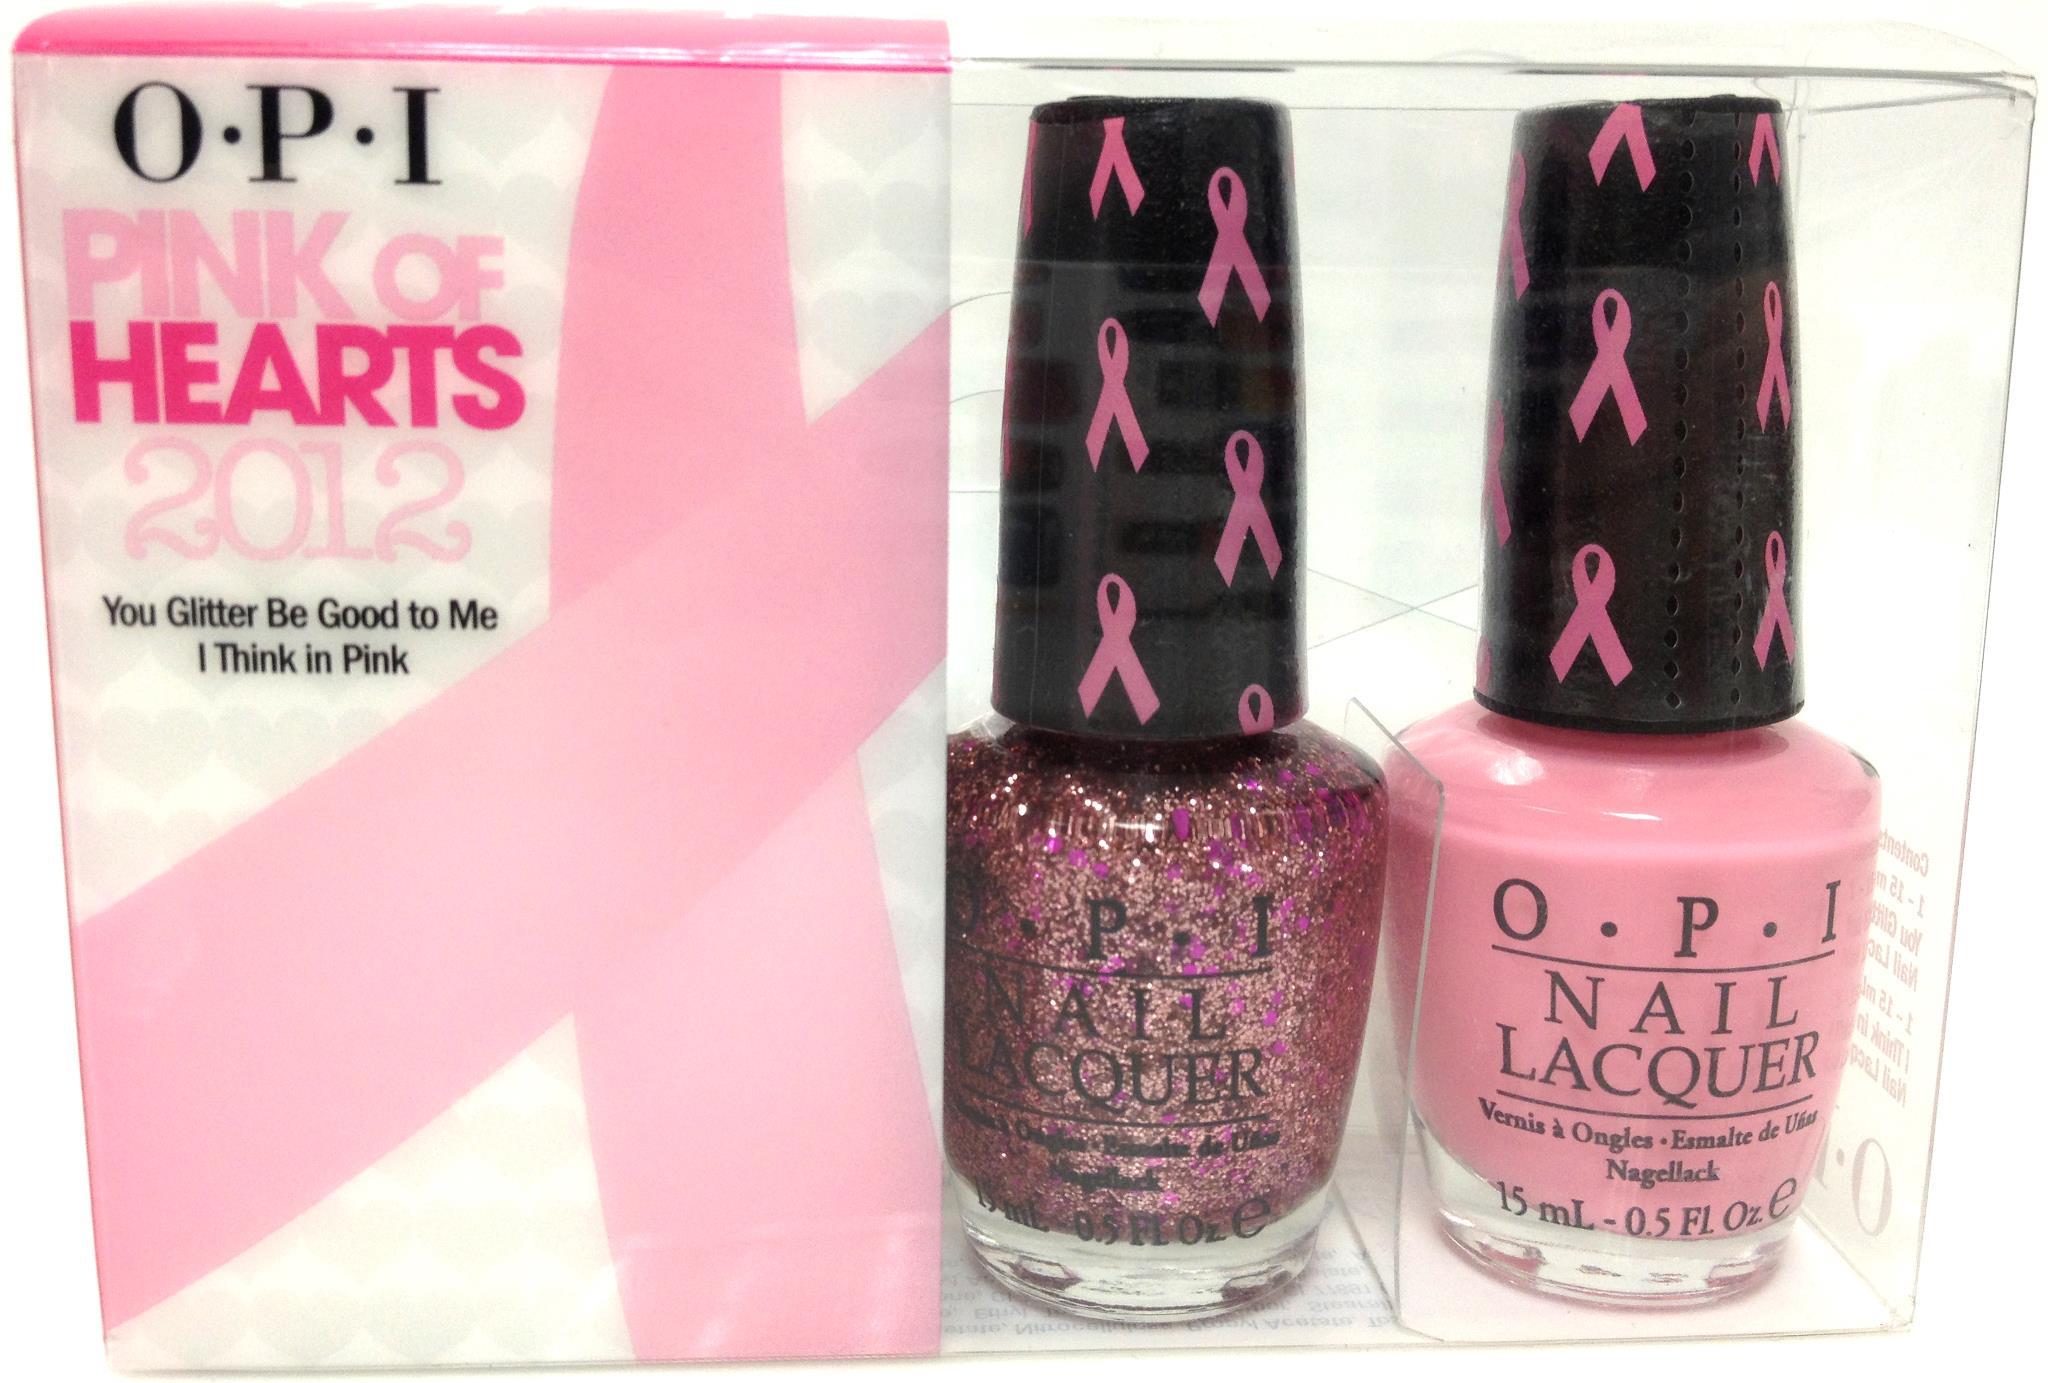 Pink-of-hearts-OPI-Nastro-Rosa-2012Opi Pink Of Hearts 2012